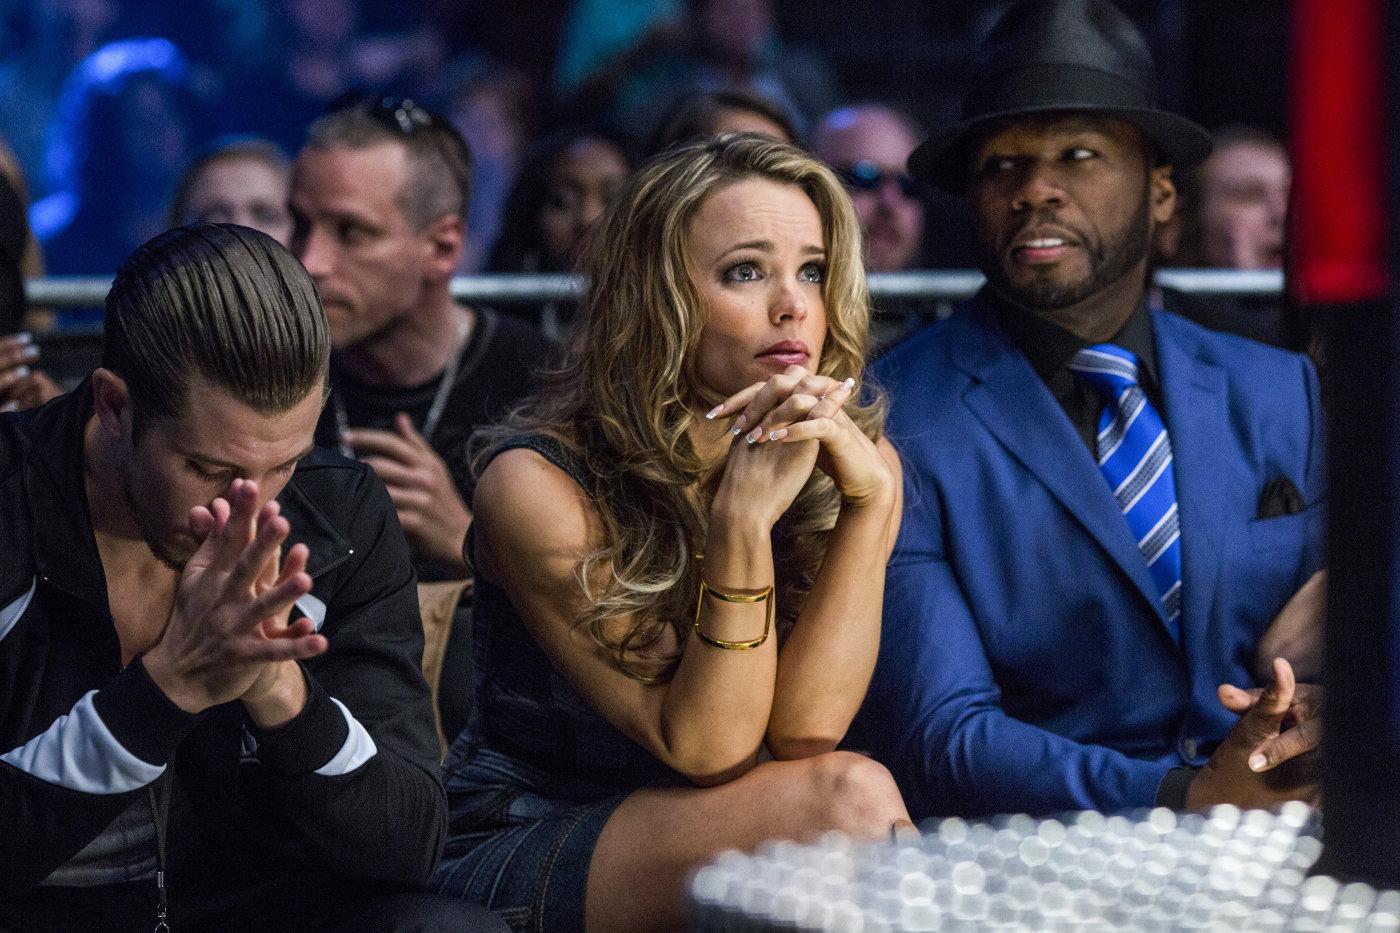 Southpaw's Beau Knapp, Rachel McAdams and 50 Cent's Stills (2015)